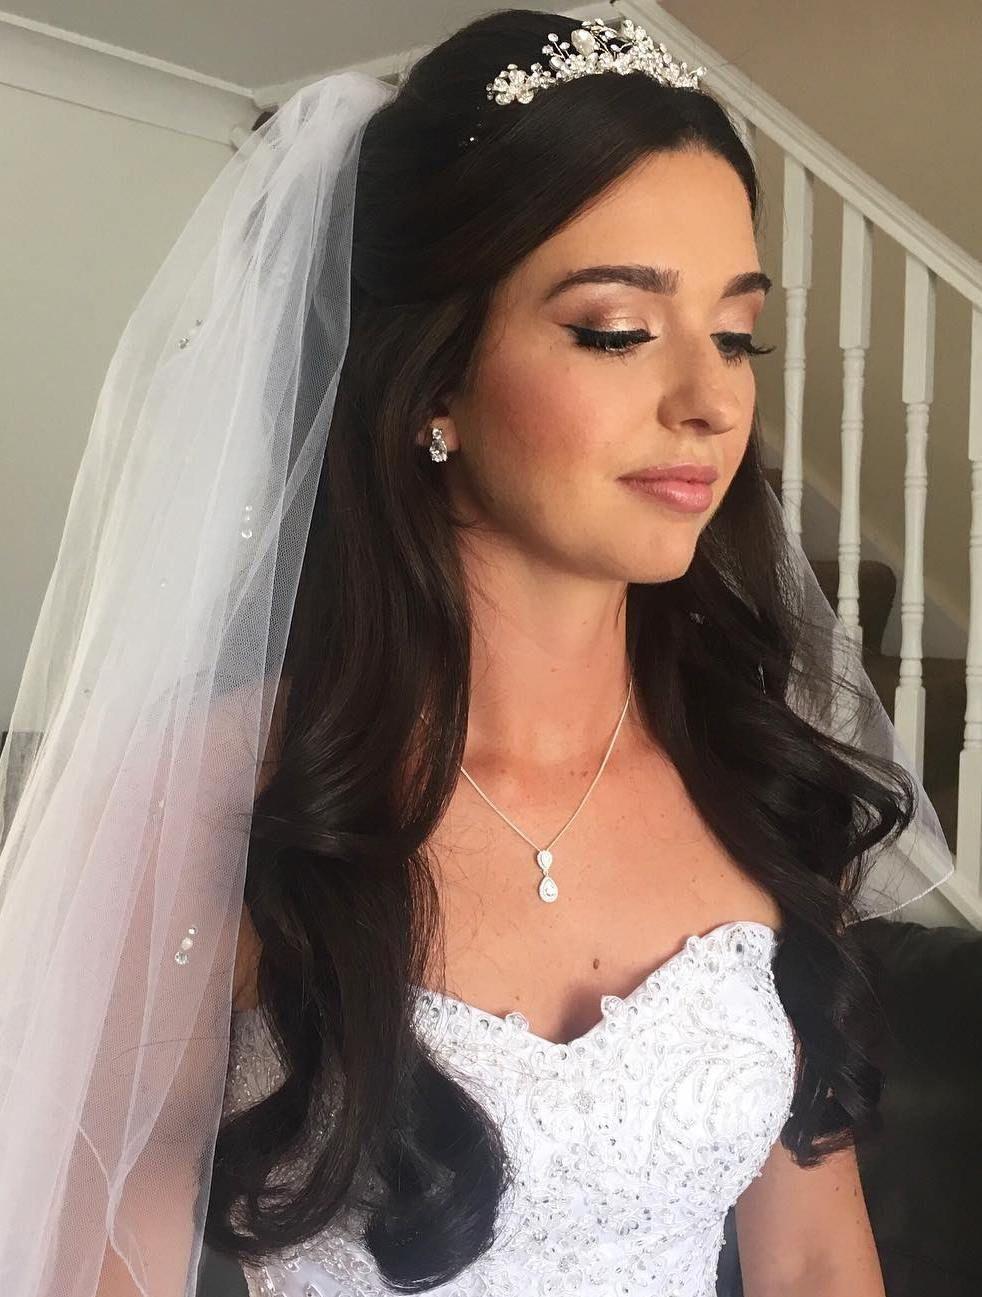 Half up half down wedding hairstyles 50 stylish ideas for brides bridal hair for veil and tiara junglespirit Gallery